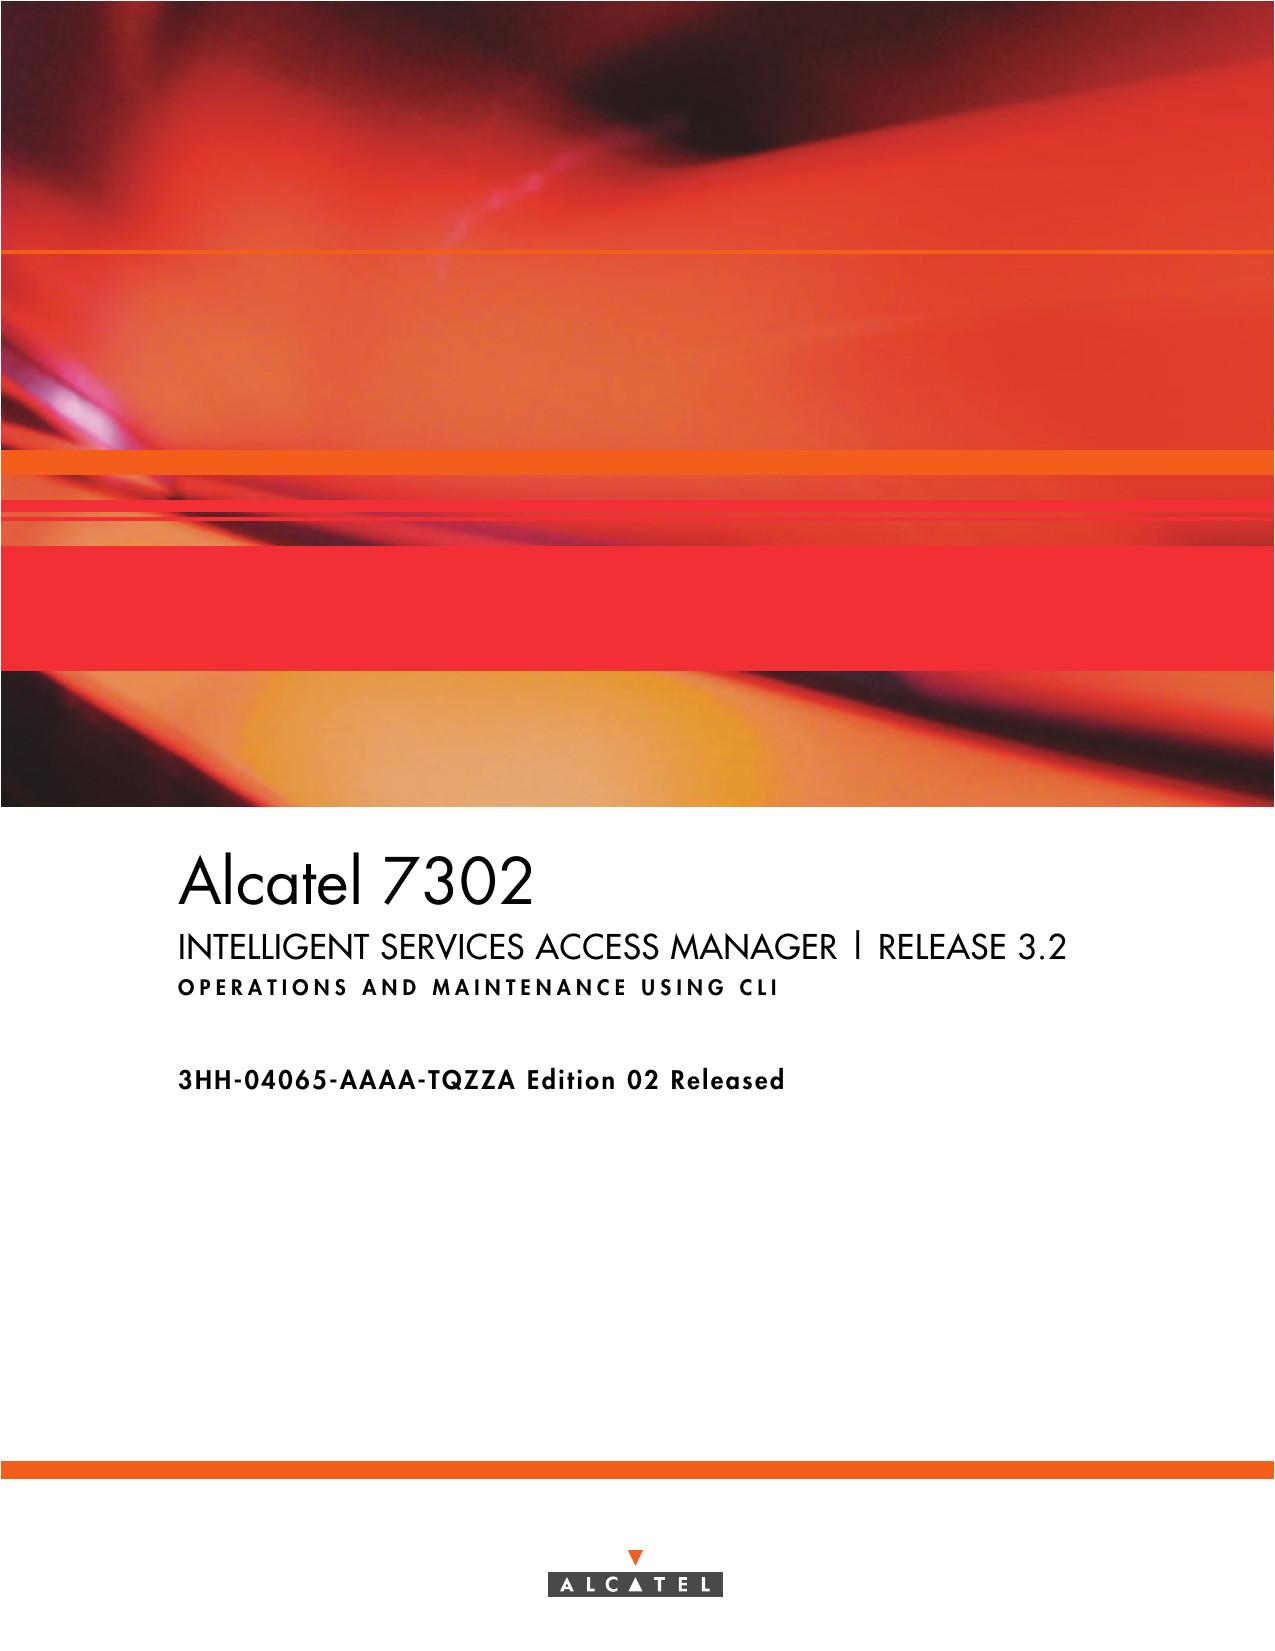 Cross Border Card (check Tac) Alcatel 7302 Manualzz